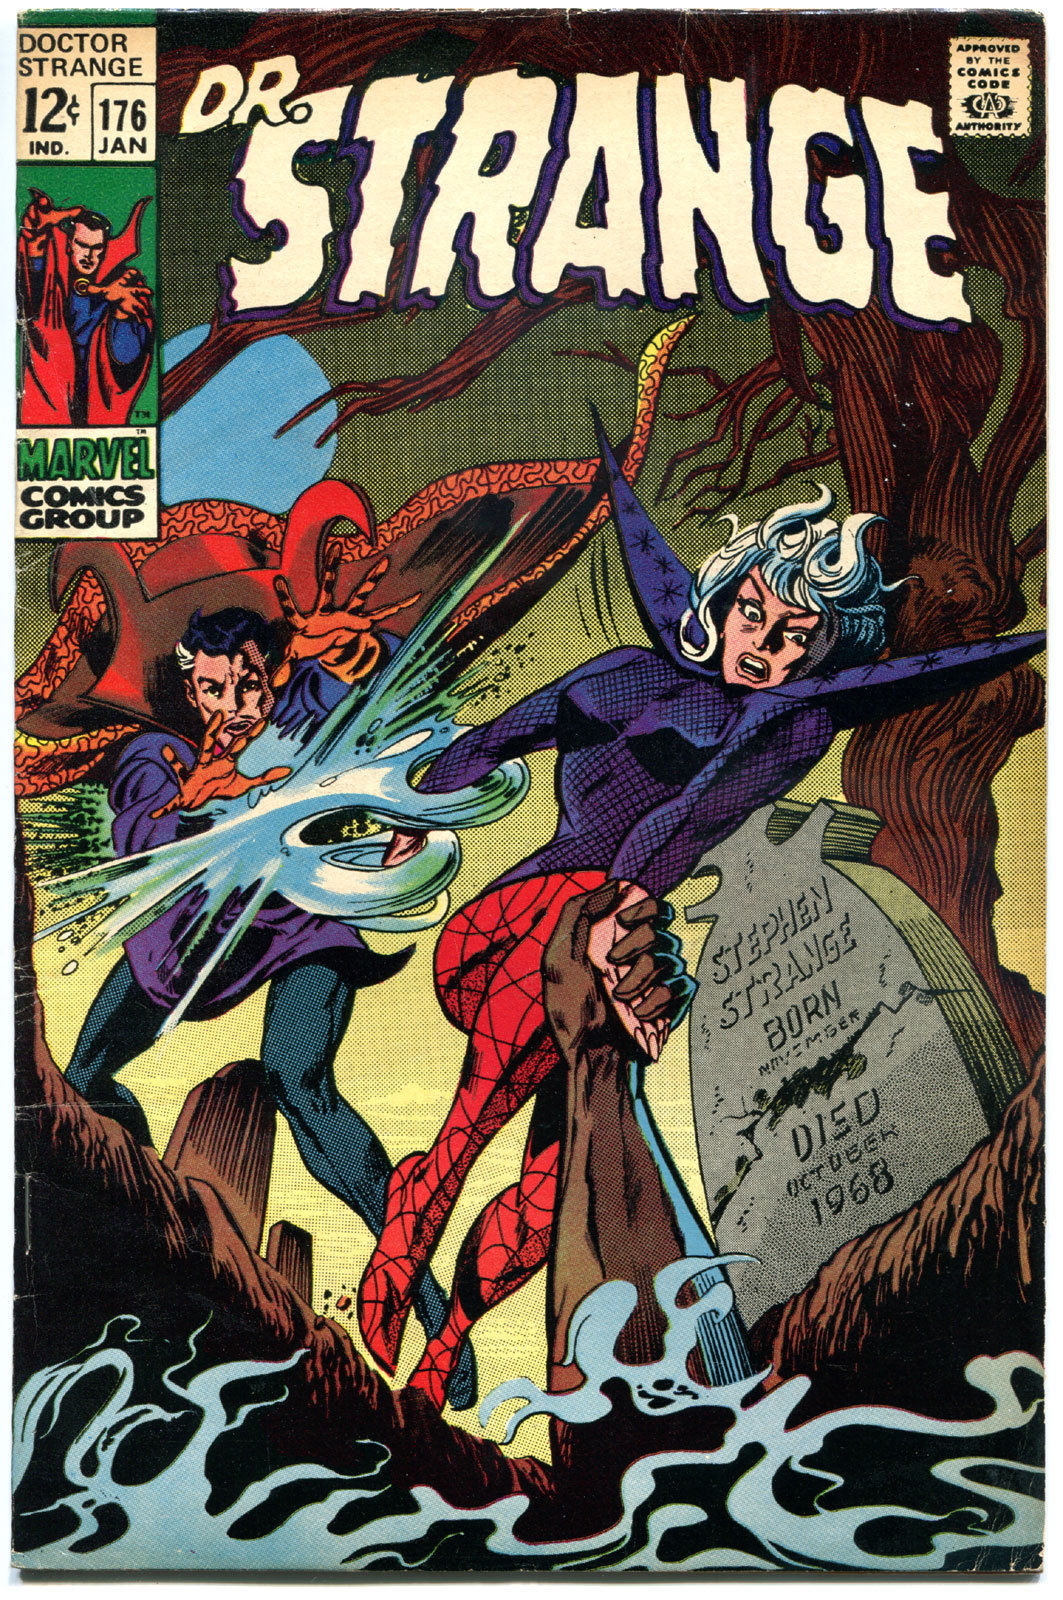 DOCTOR STRANGE #176, FN+, Mystic Arts, Gene Colan, 1968, more DS in store, QXT